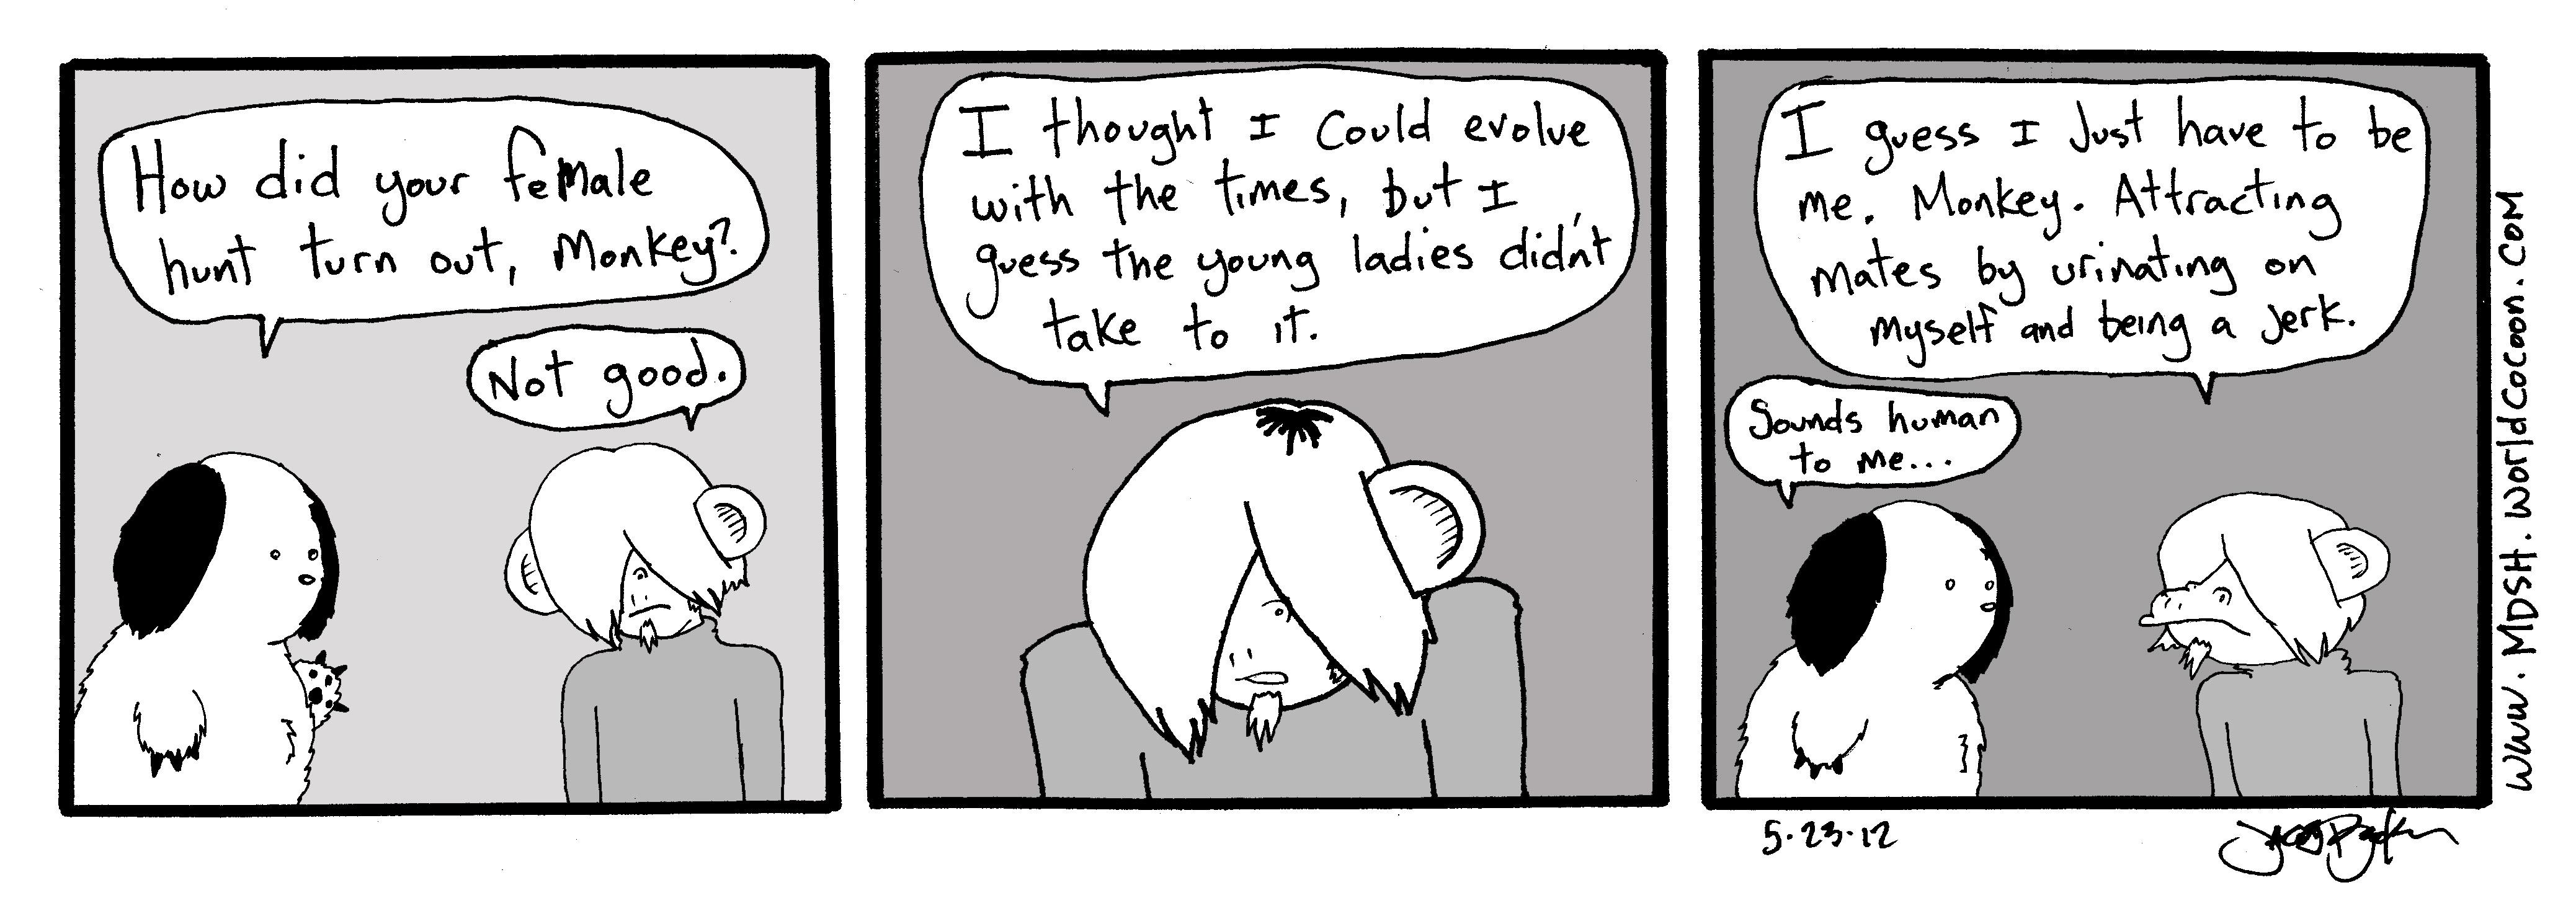 05/23/2012